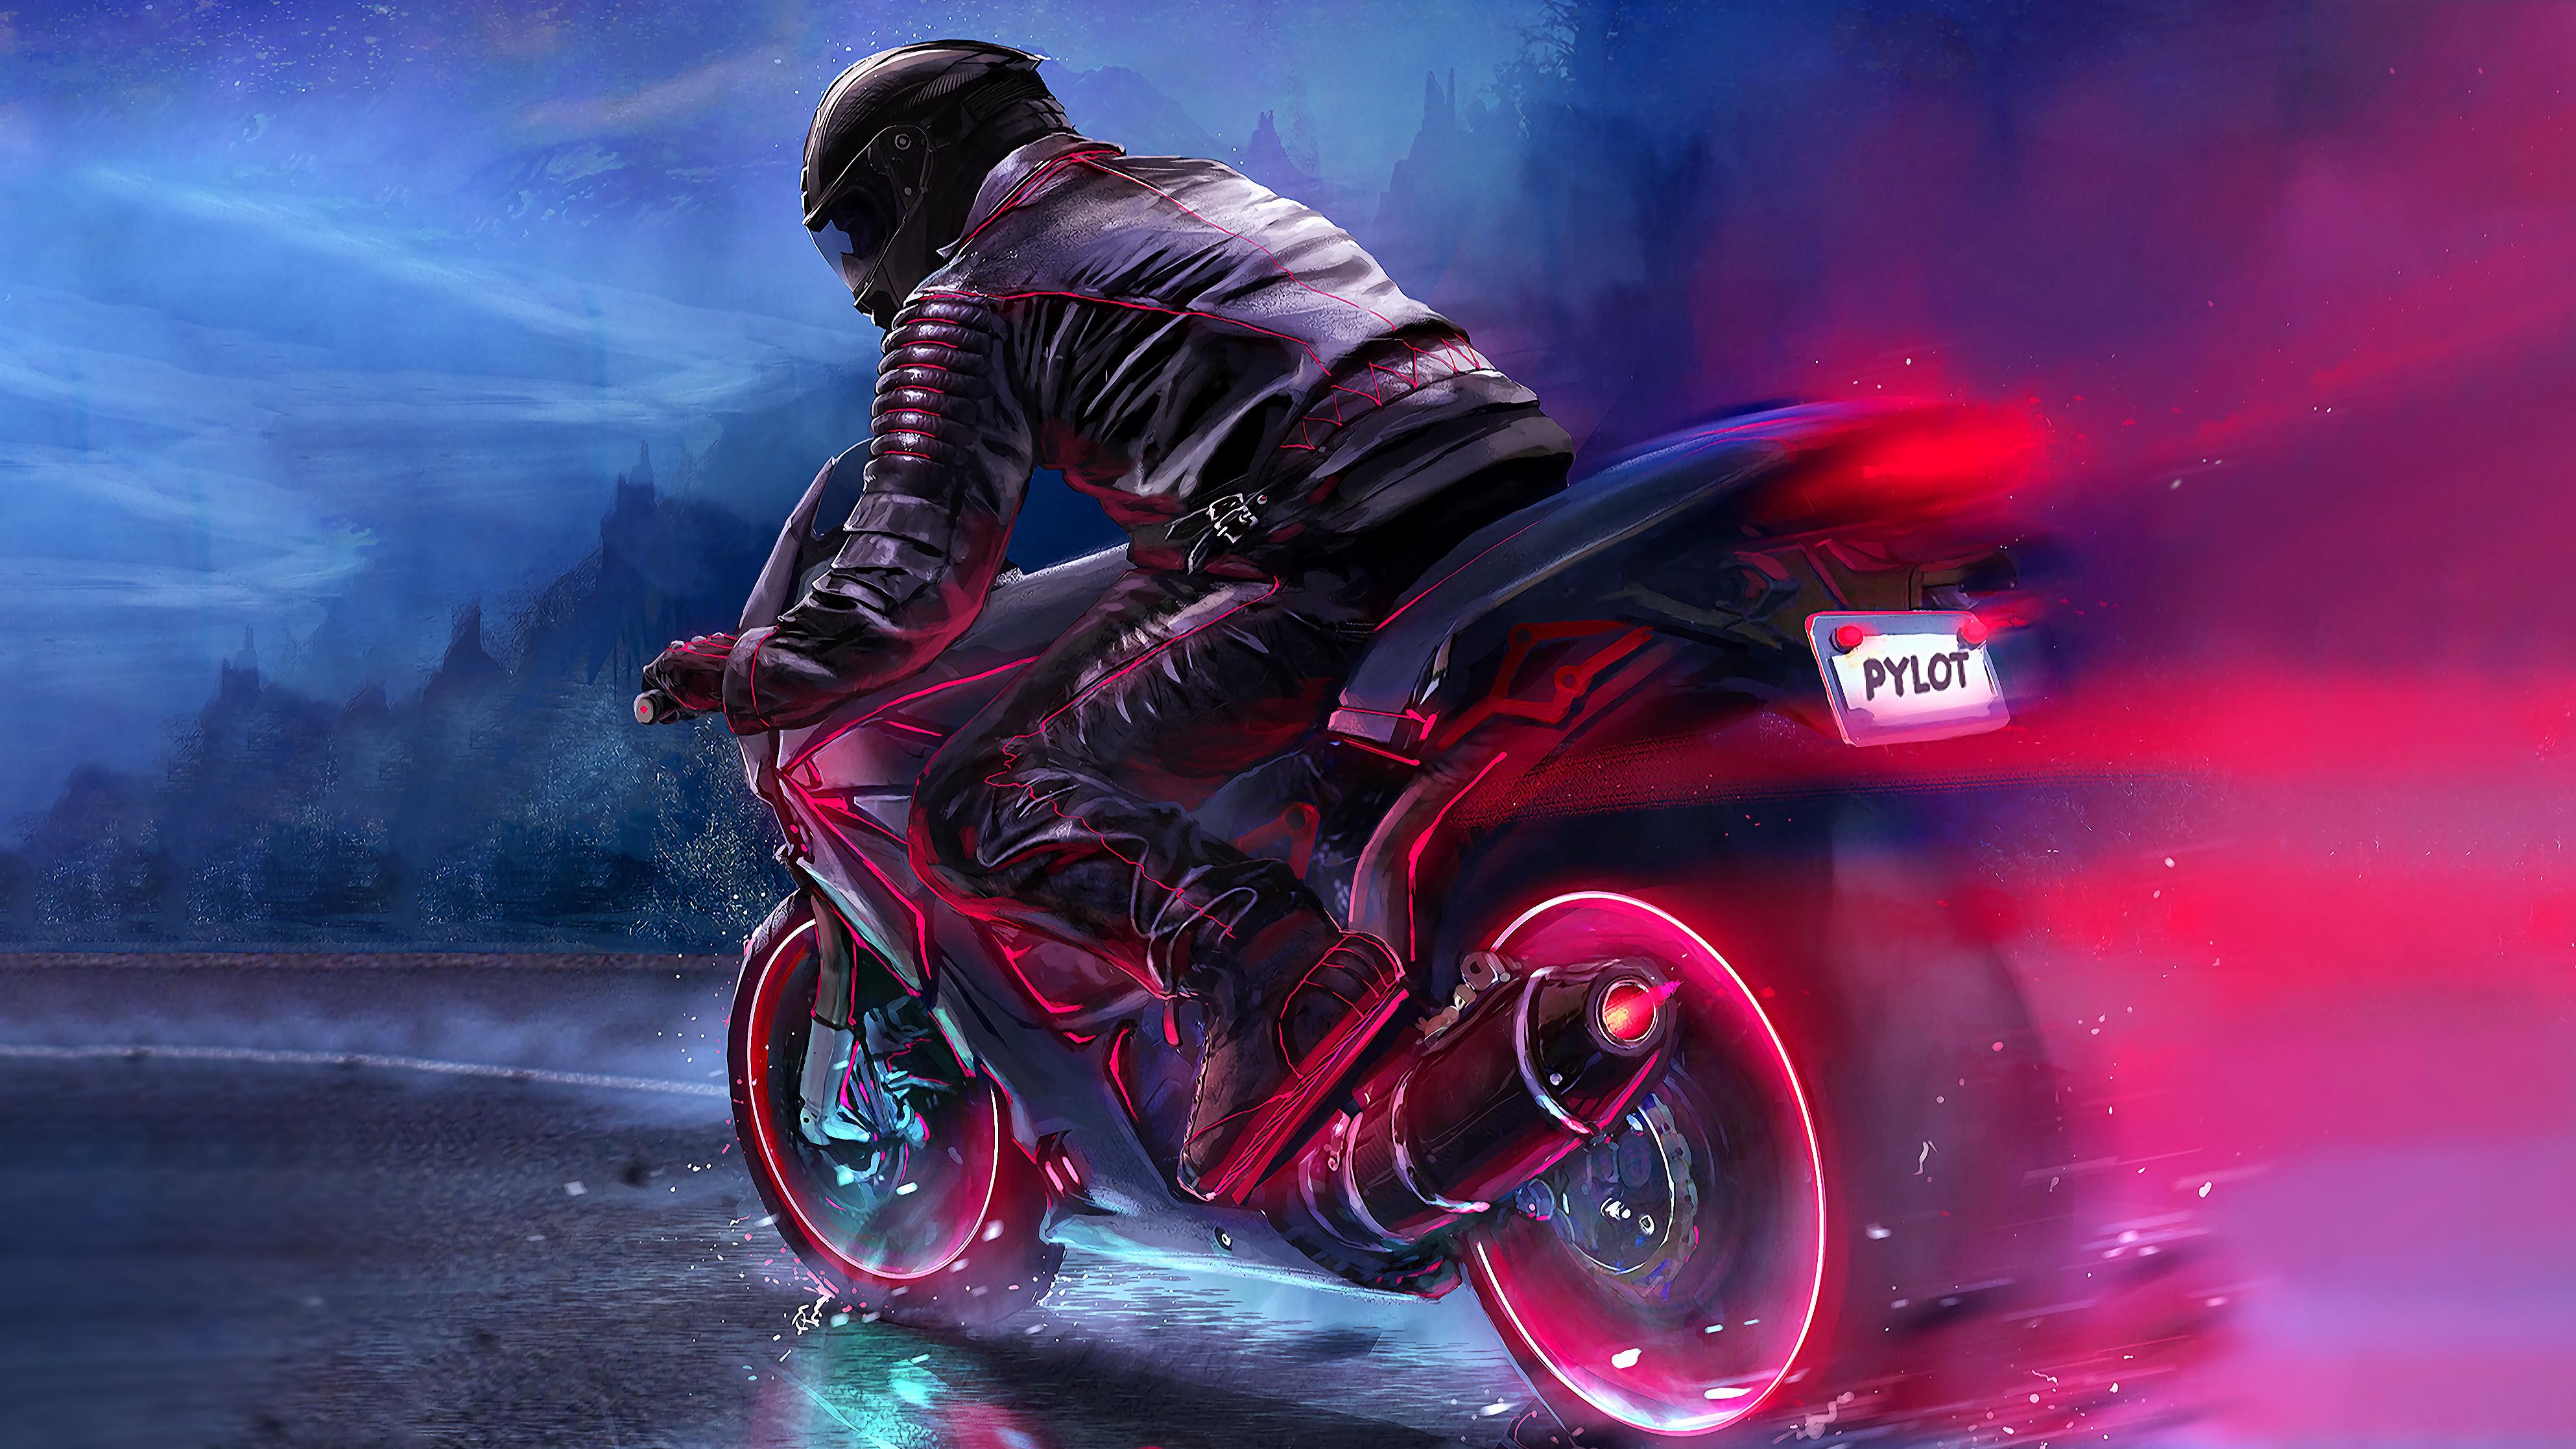 1366x768 Retro Bike Rider 4k 1366x768 Resolution HD 4k ...